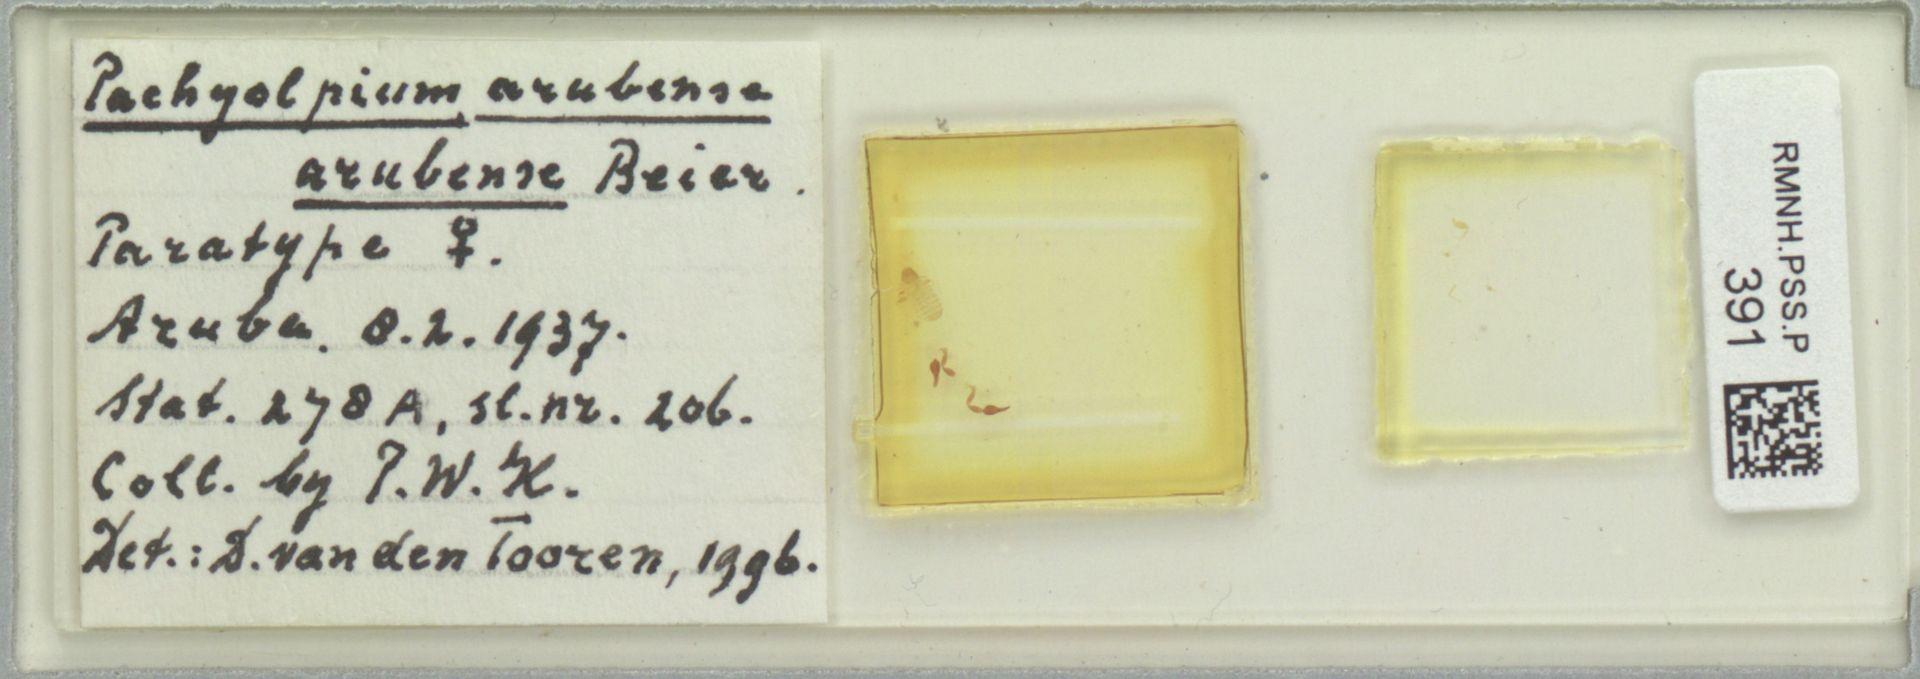 RMNH.PSS.P.391   Pachyolpium (arubense) arubense